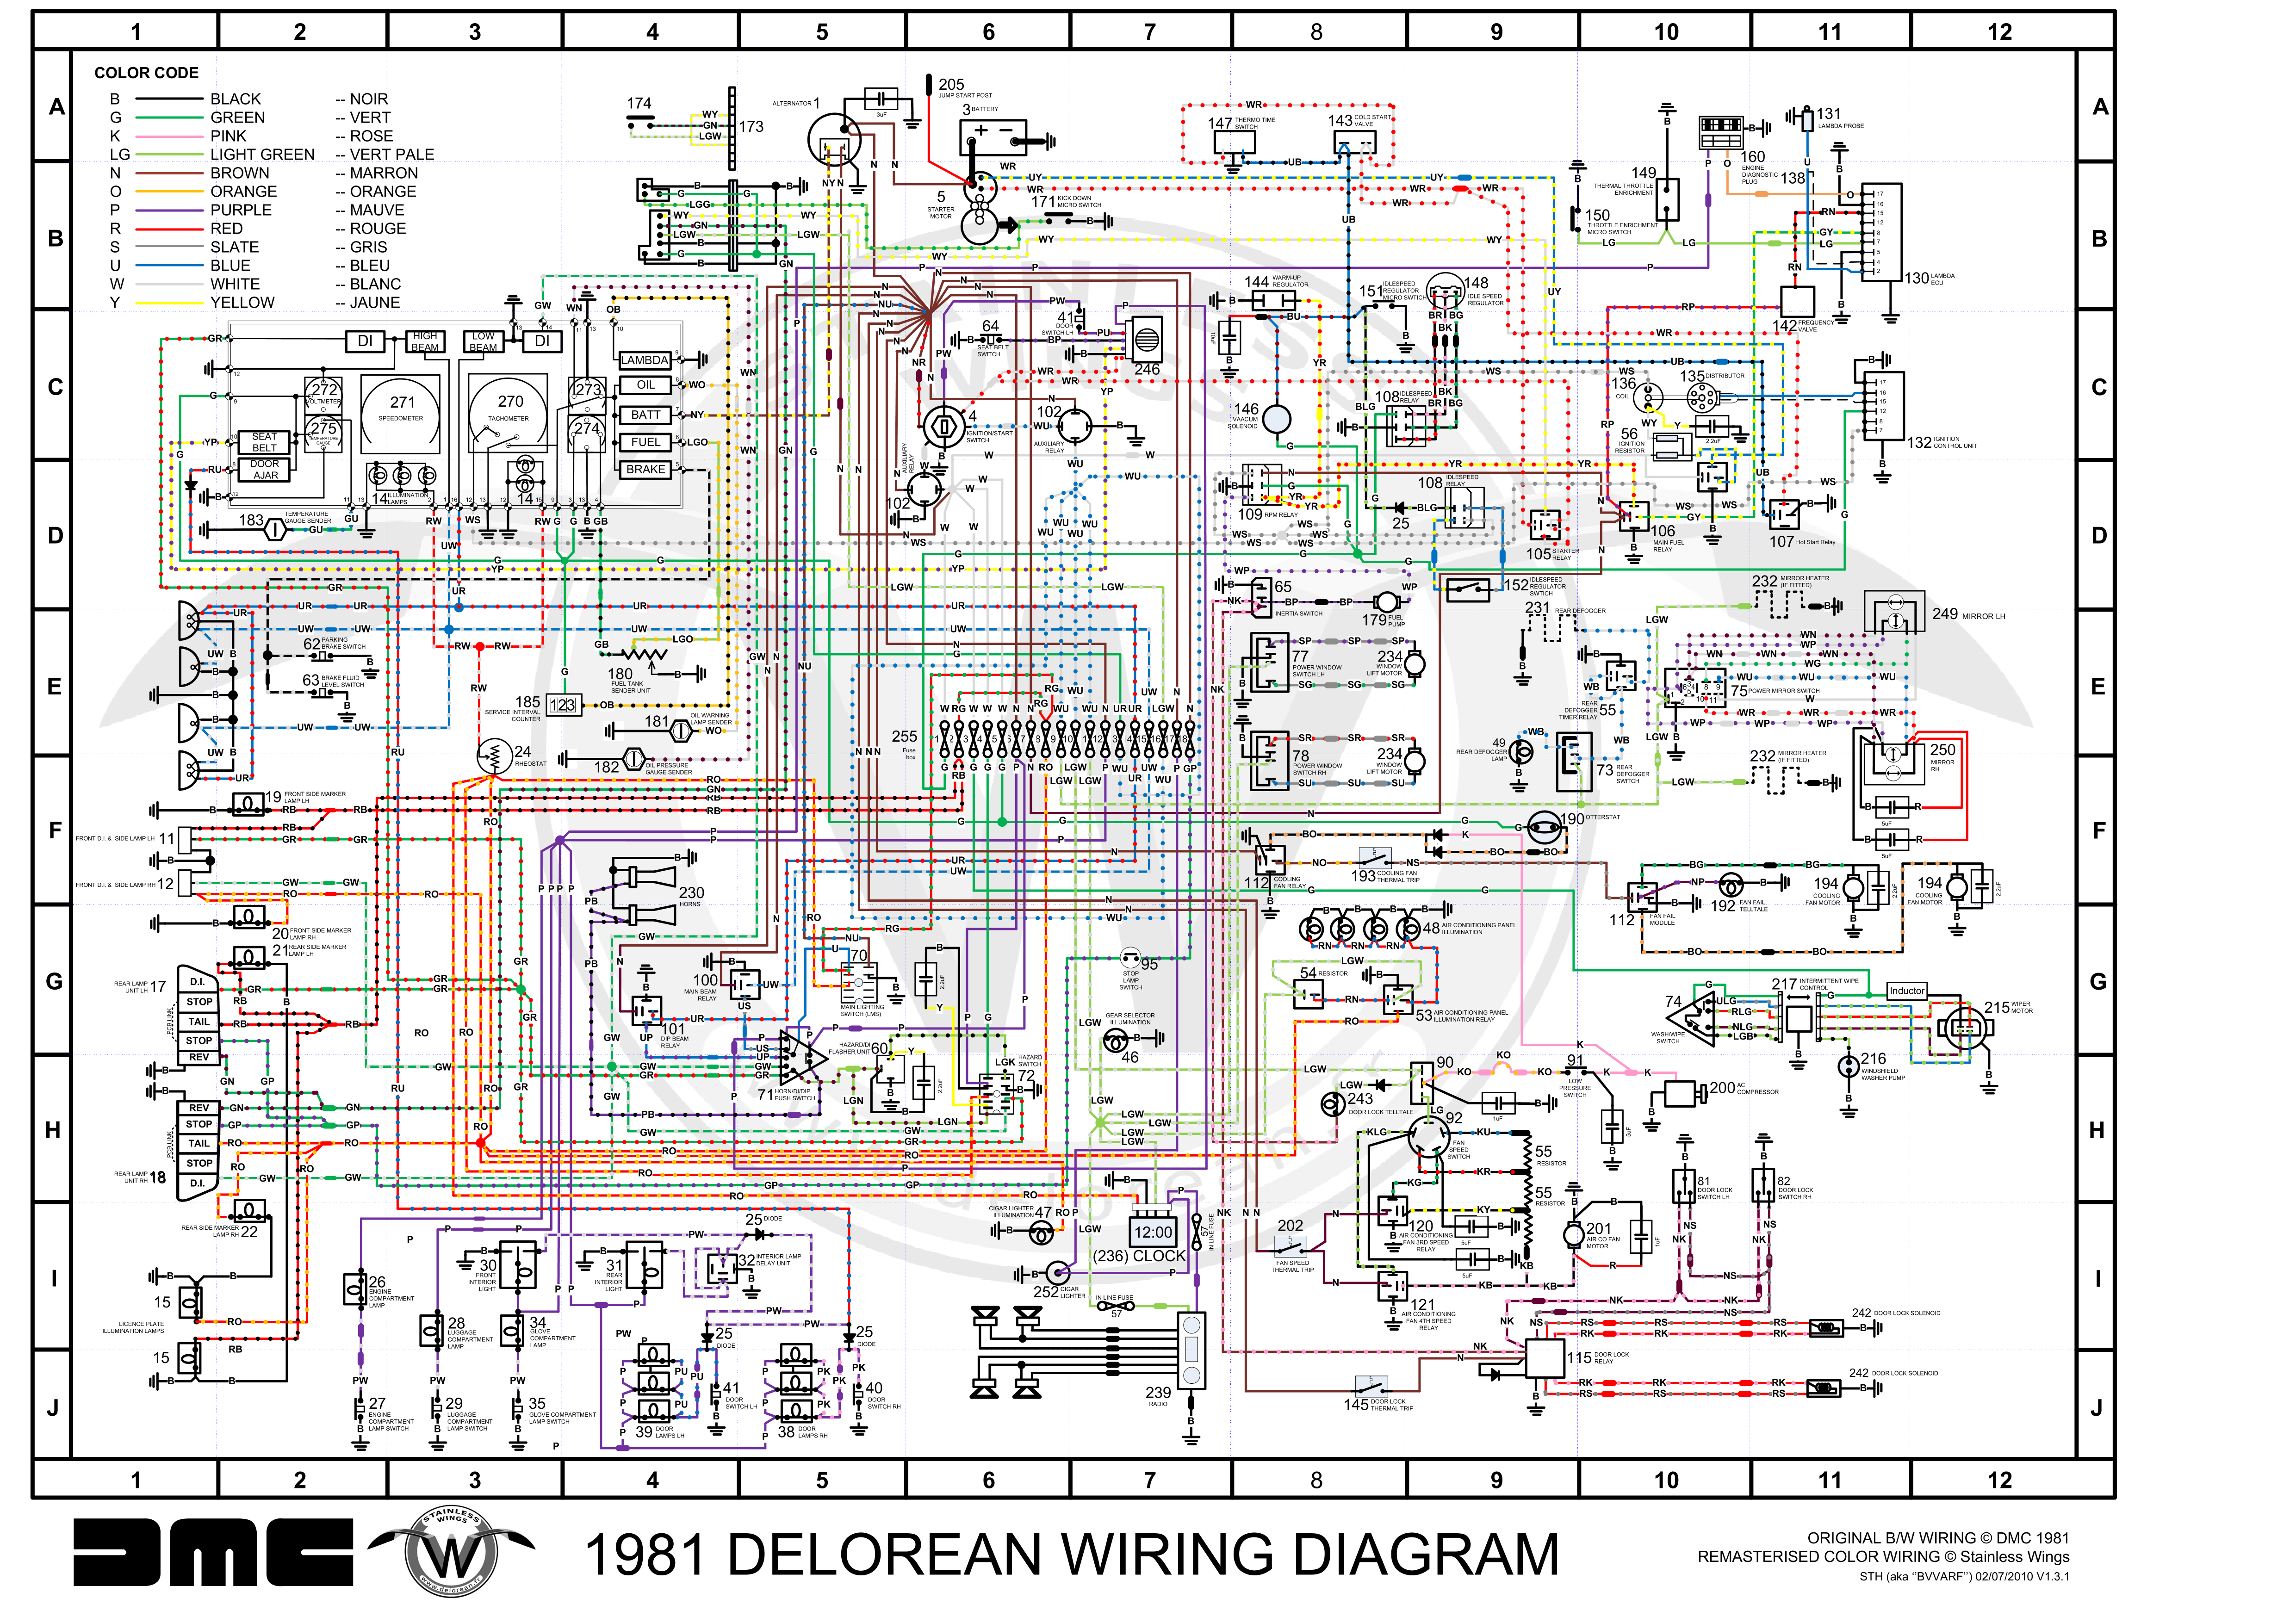 Powakaddy Wiring Diagram Legend - Honda 125 Wiring Diagram -  impalafuse.yenpancane.jeanjaures37.fr   Powakaddy Wiring Diagram Legend      Wiring Diagram Resource